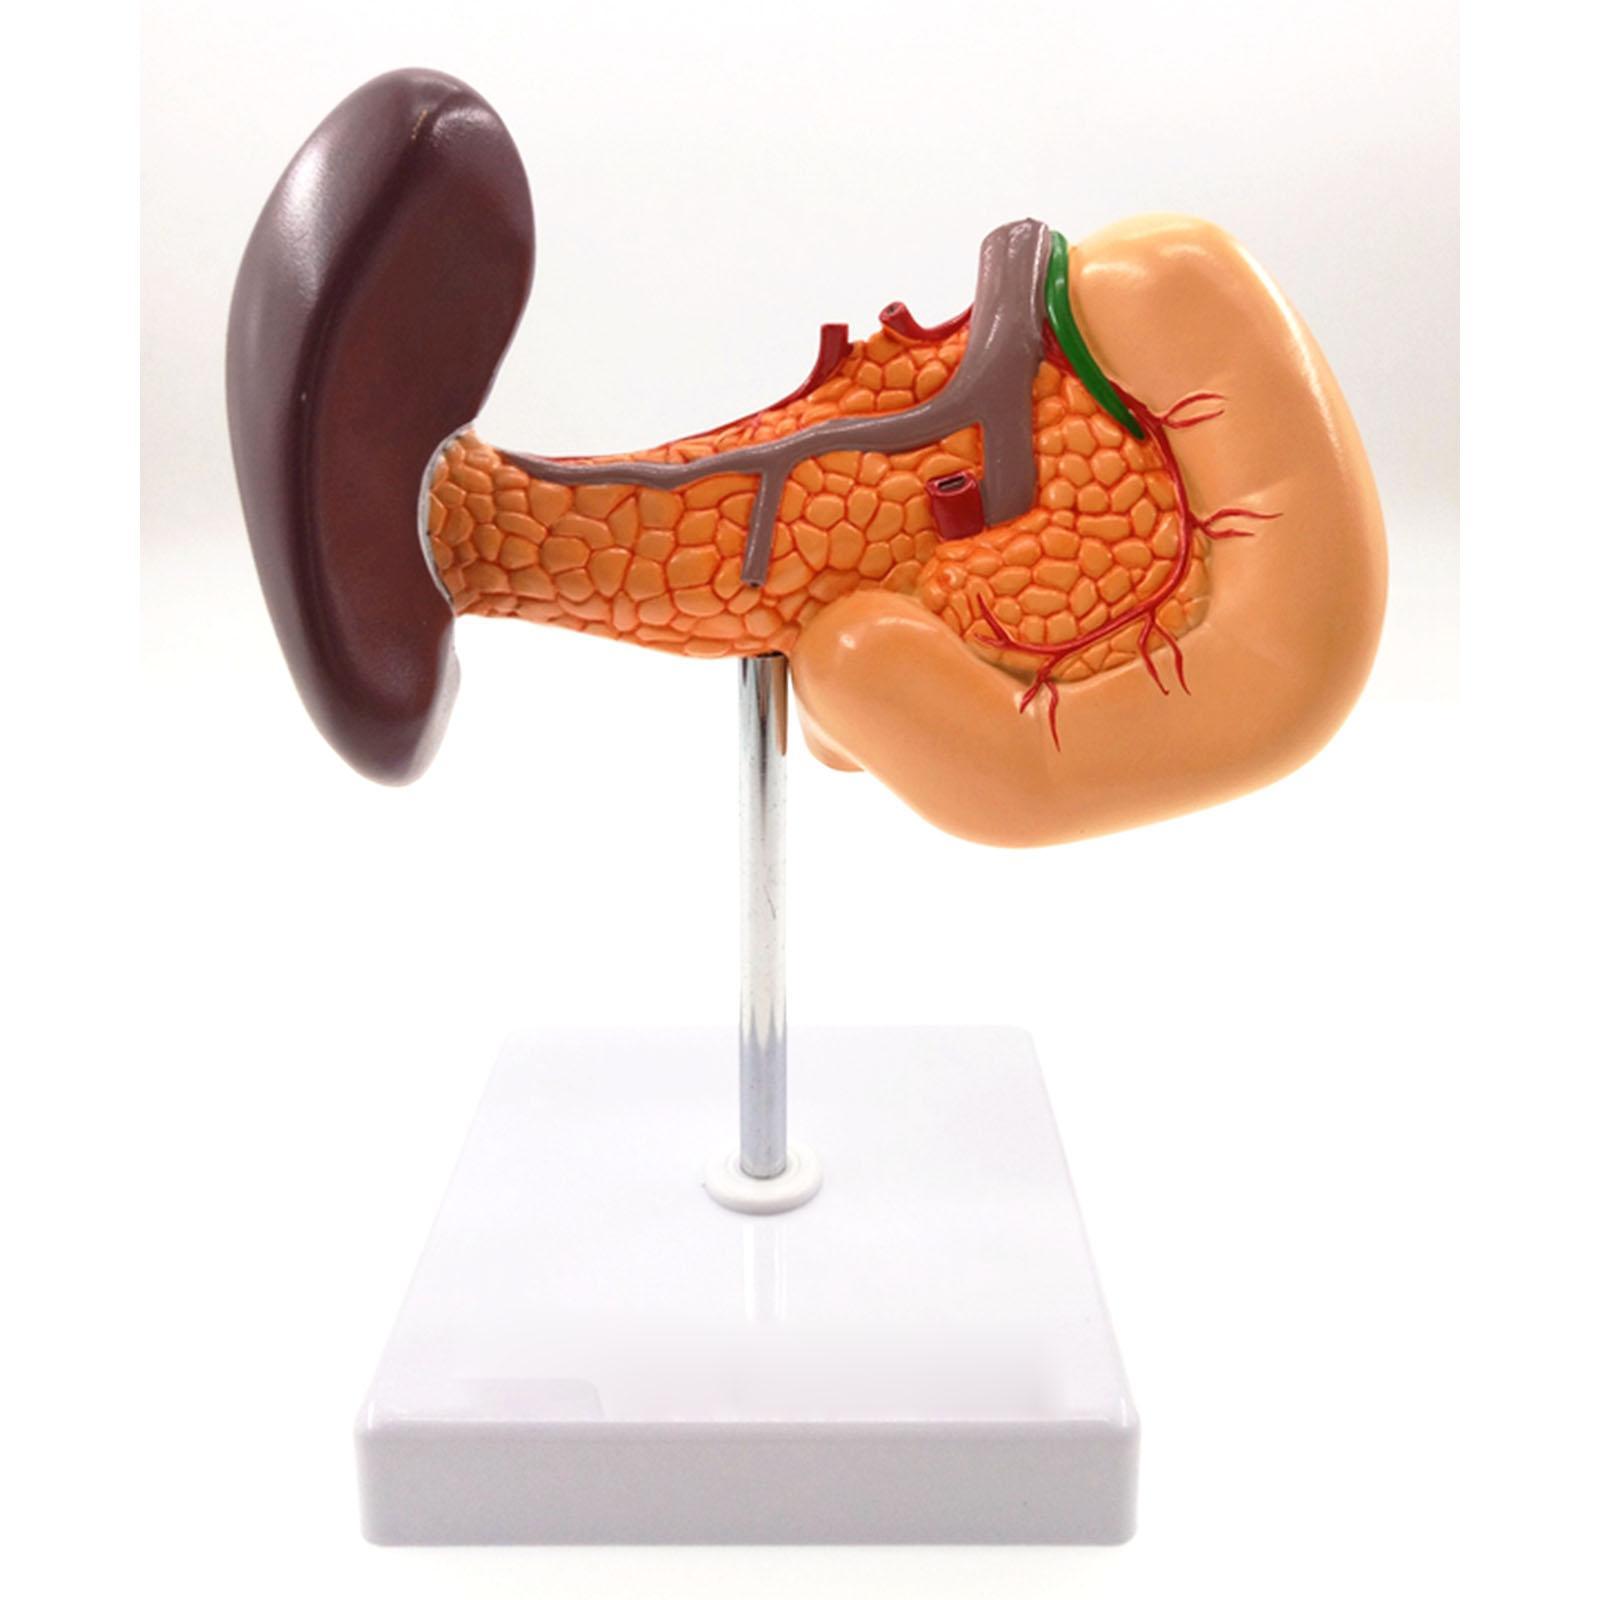 Pancreas Spleen Gallbladder Liver Duodenum Human Body Anatomy Medical Model Life Size 1:1 Teaching Resources